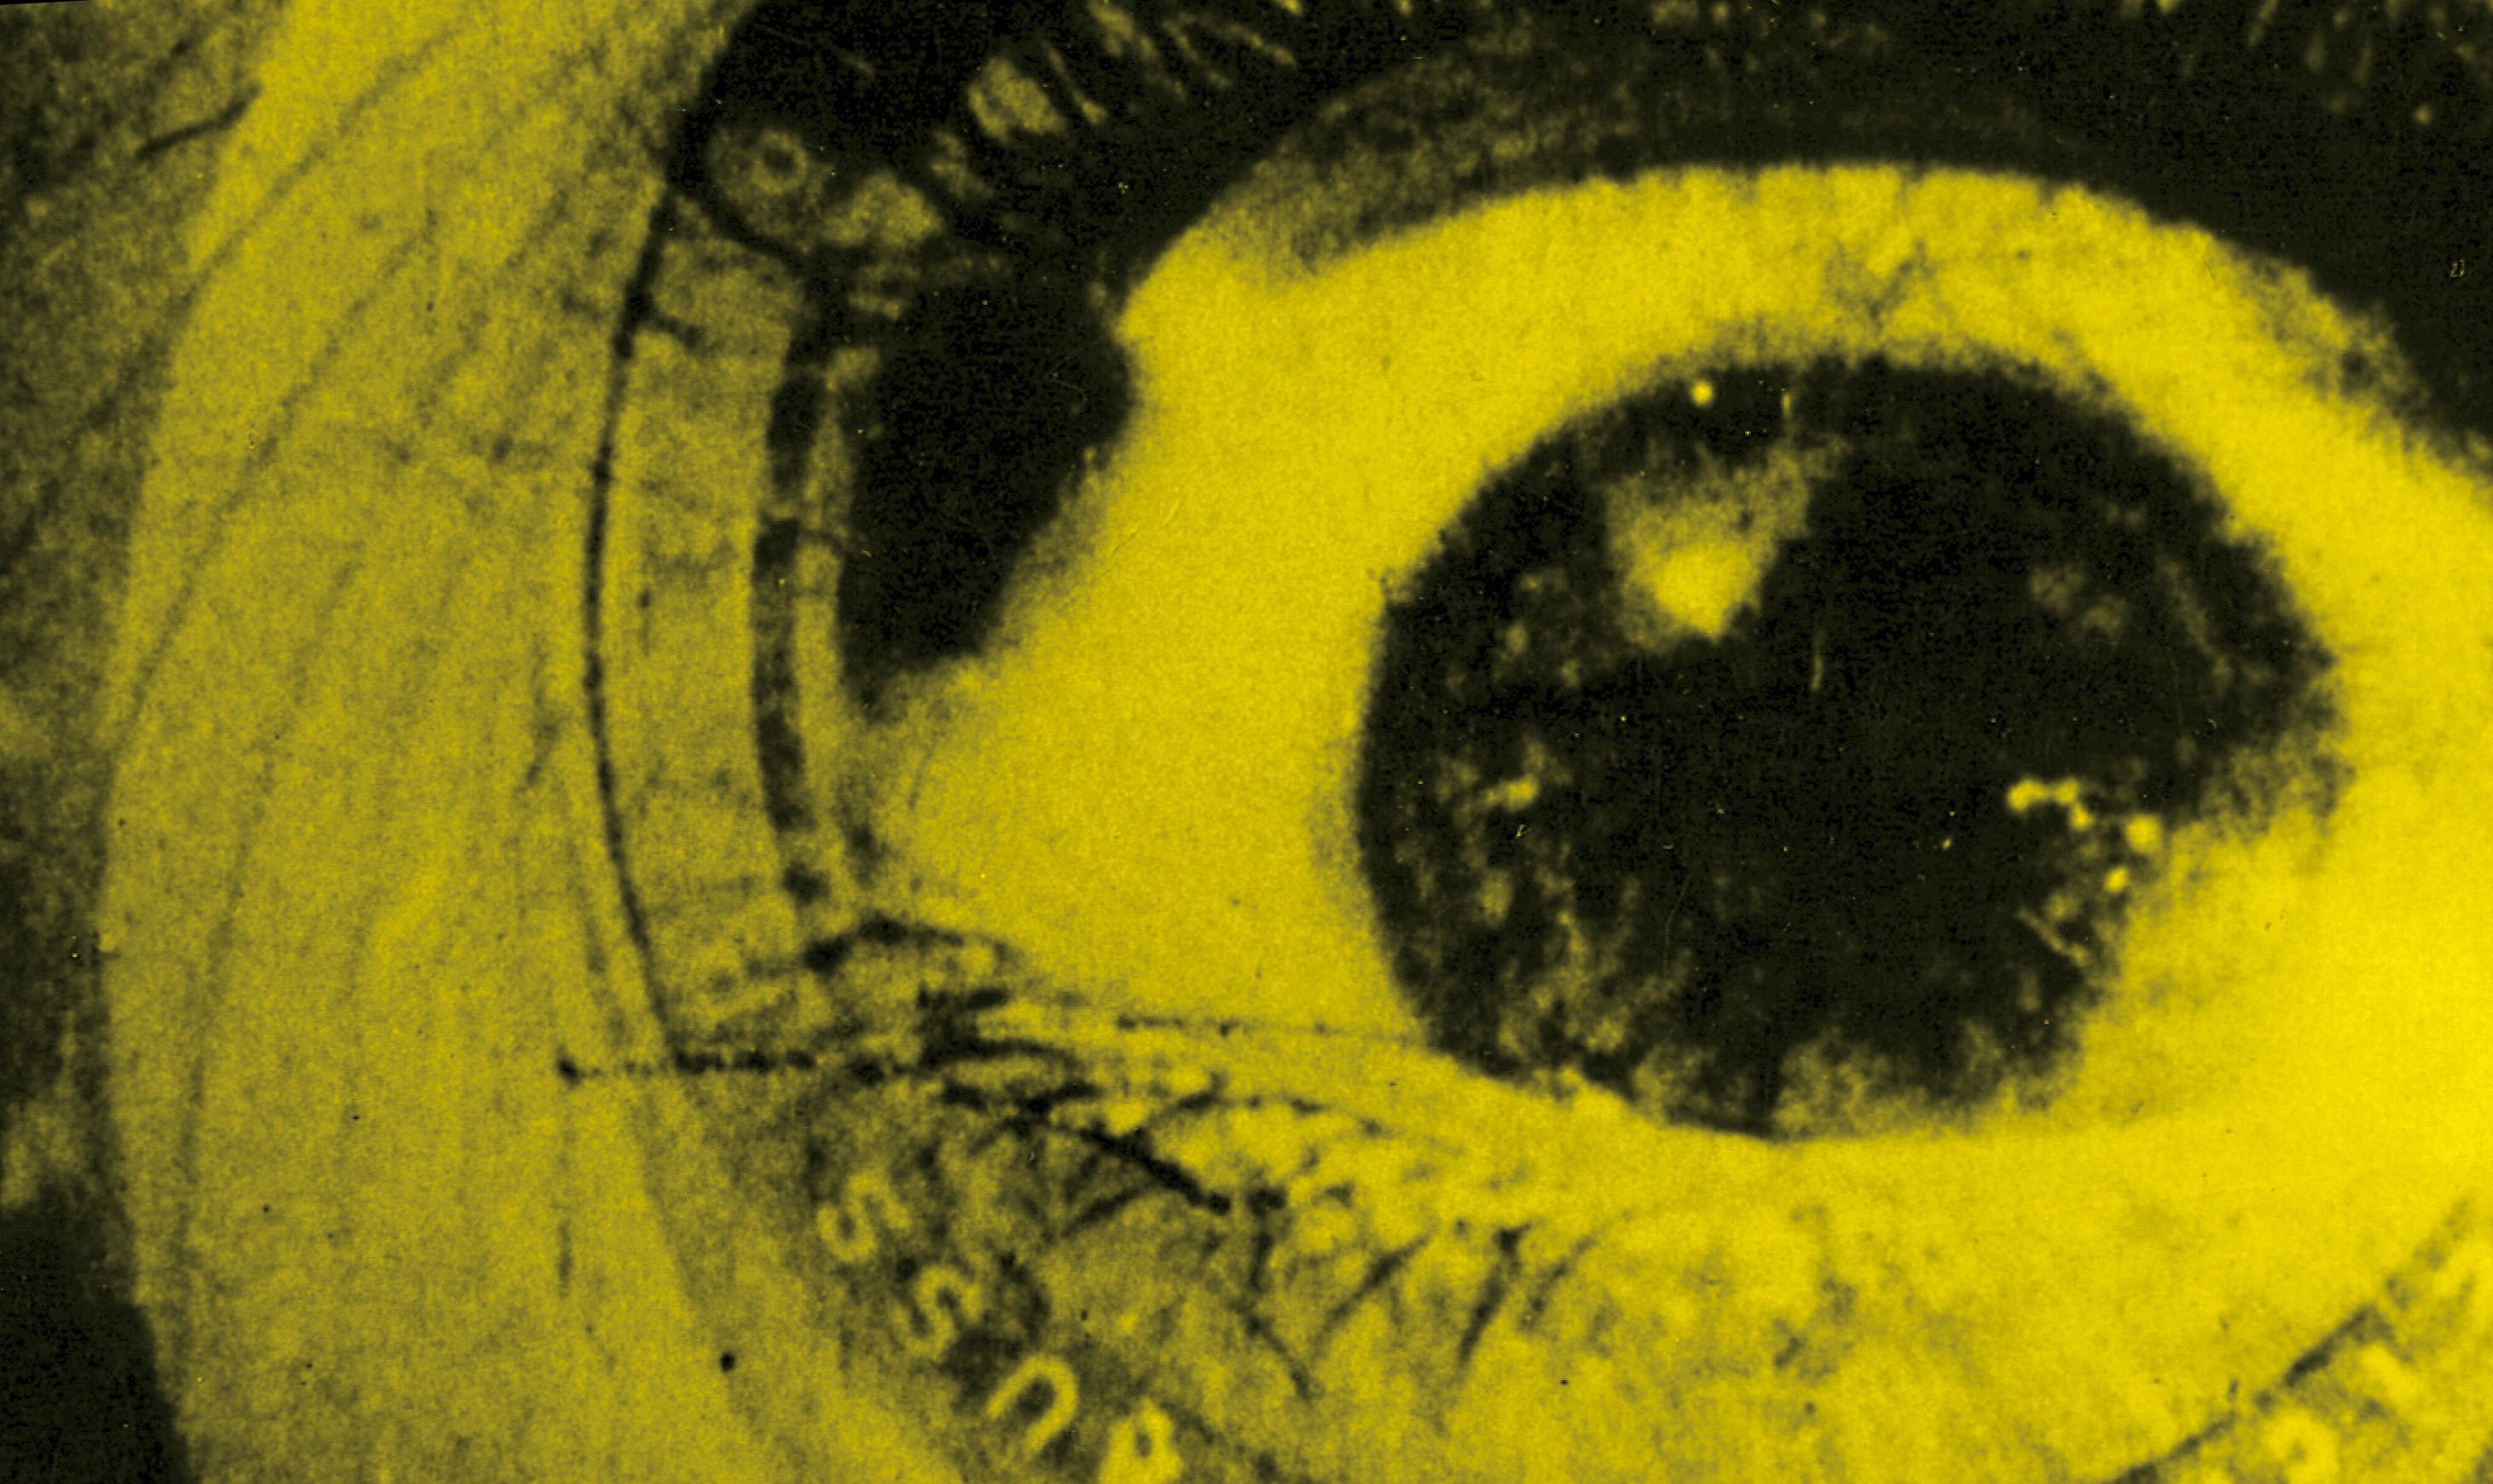 cameras de surveillance et vie privee